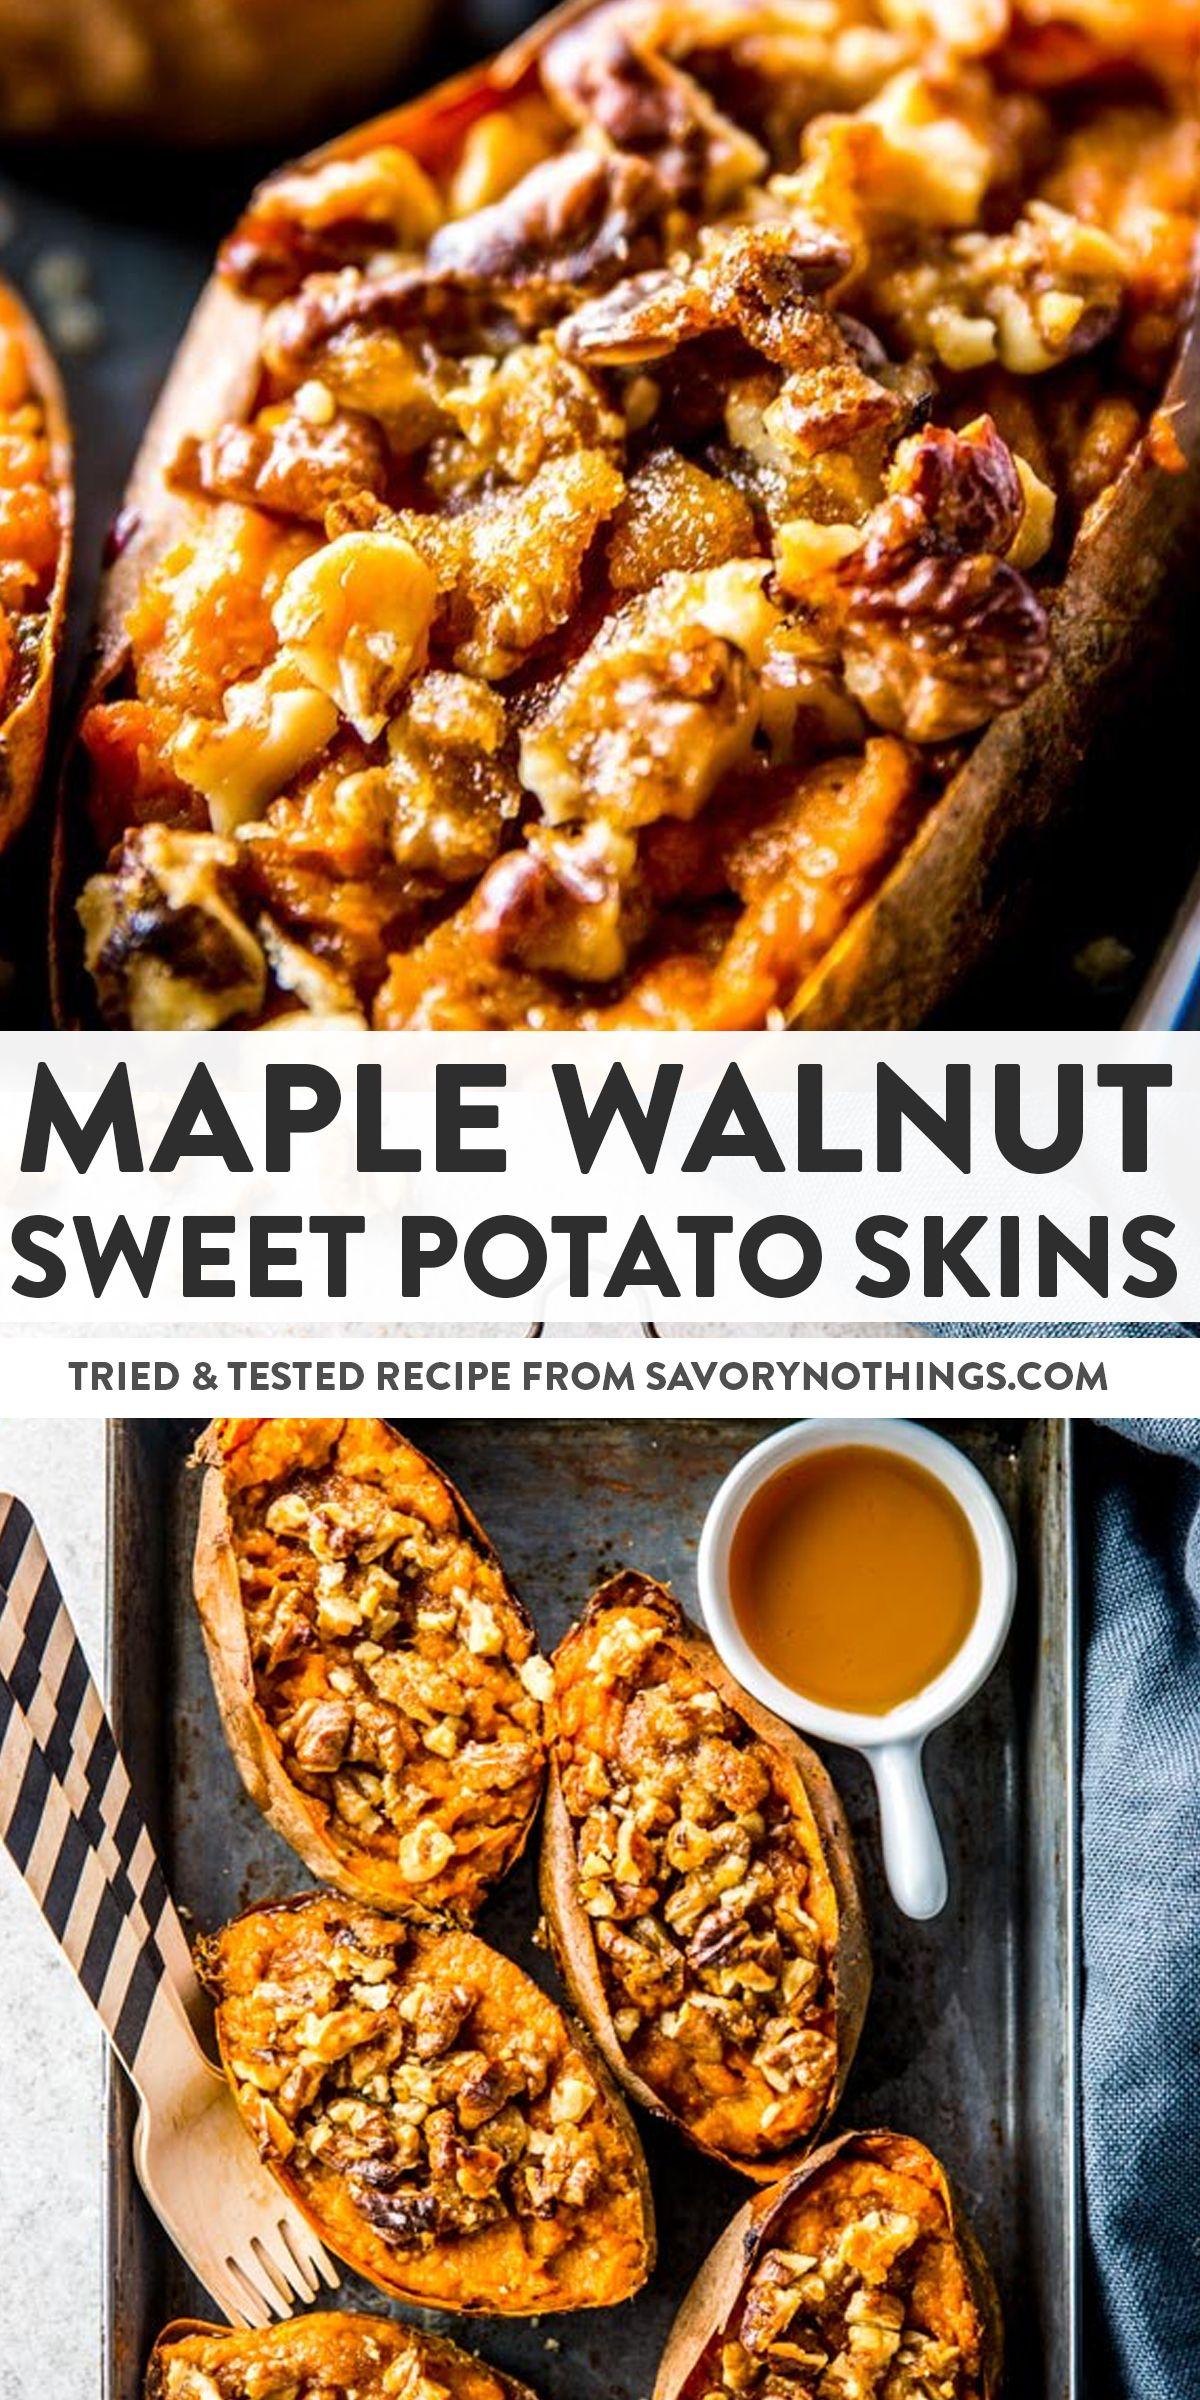 Maple Walnut Sweet Potato Skins